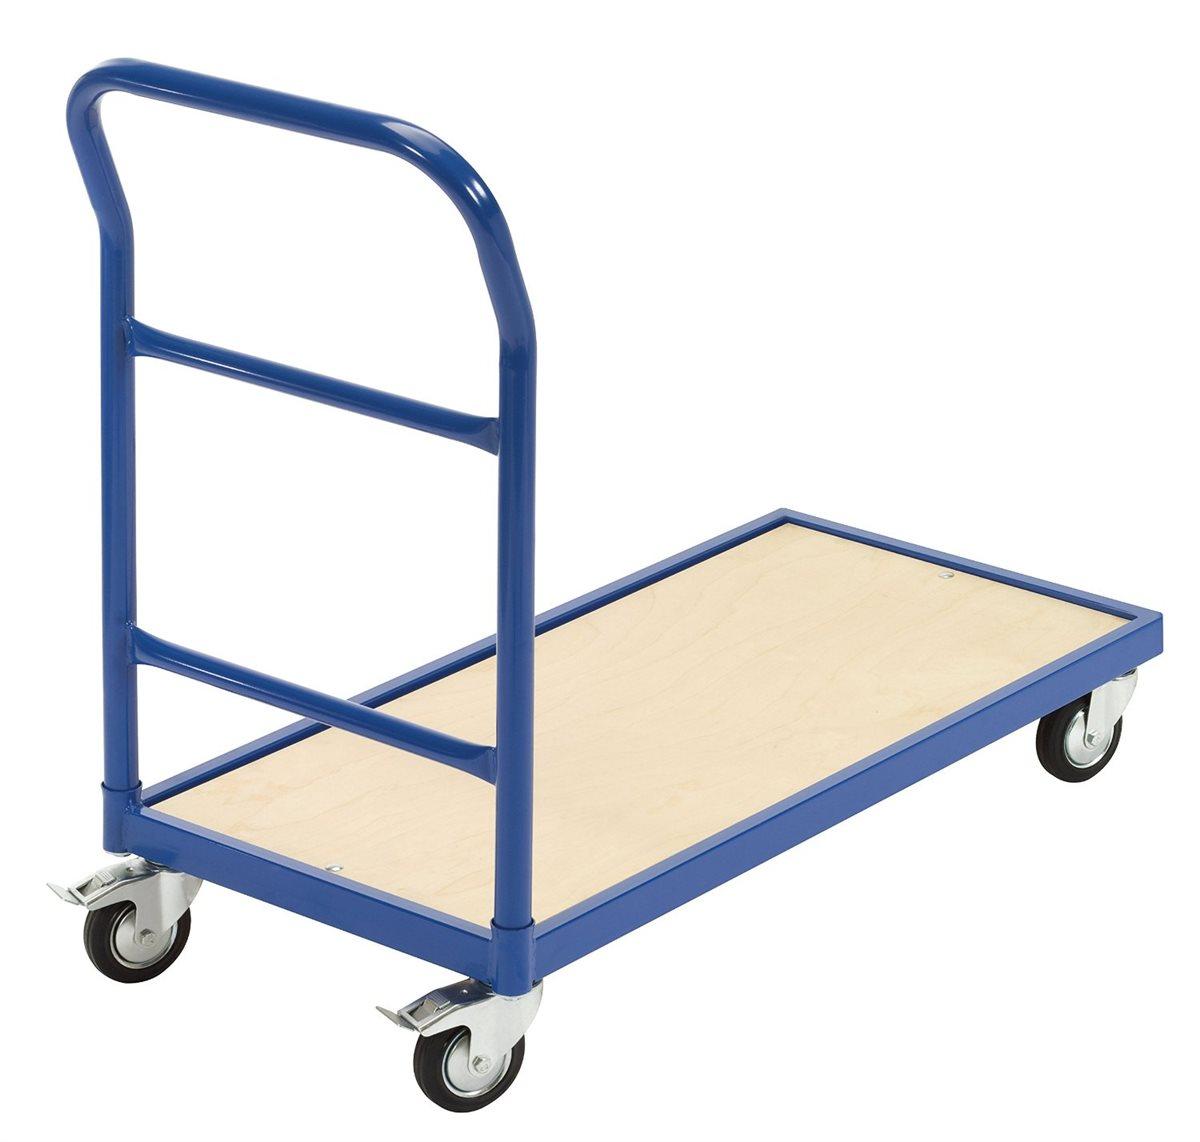 pro bau tec plattformwagen 250 kg transport magazinwagen. Black Bedroom Furniture Sets. Home Design Ideas